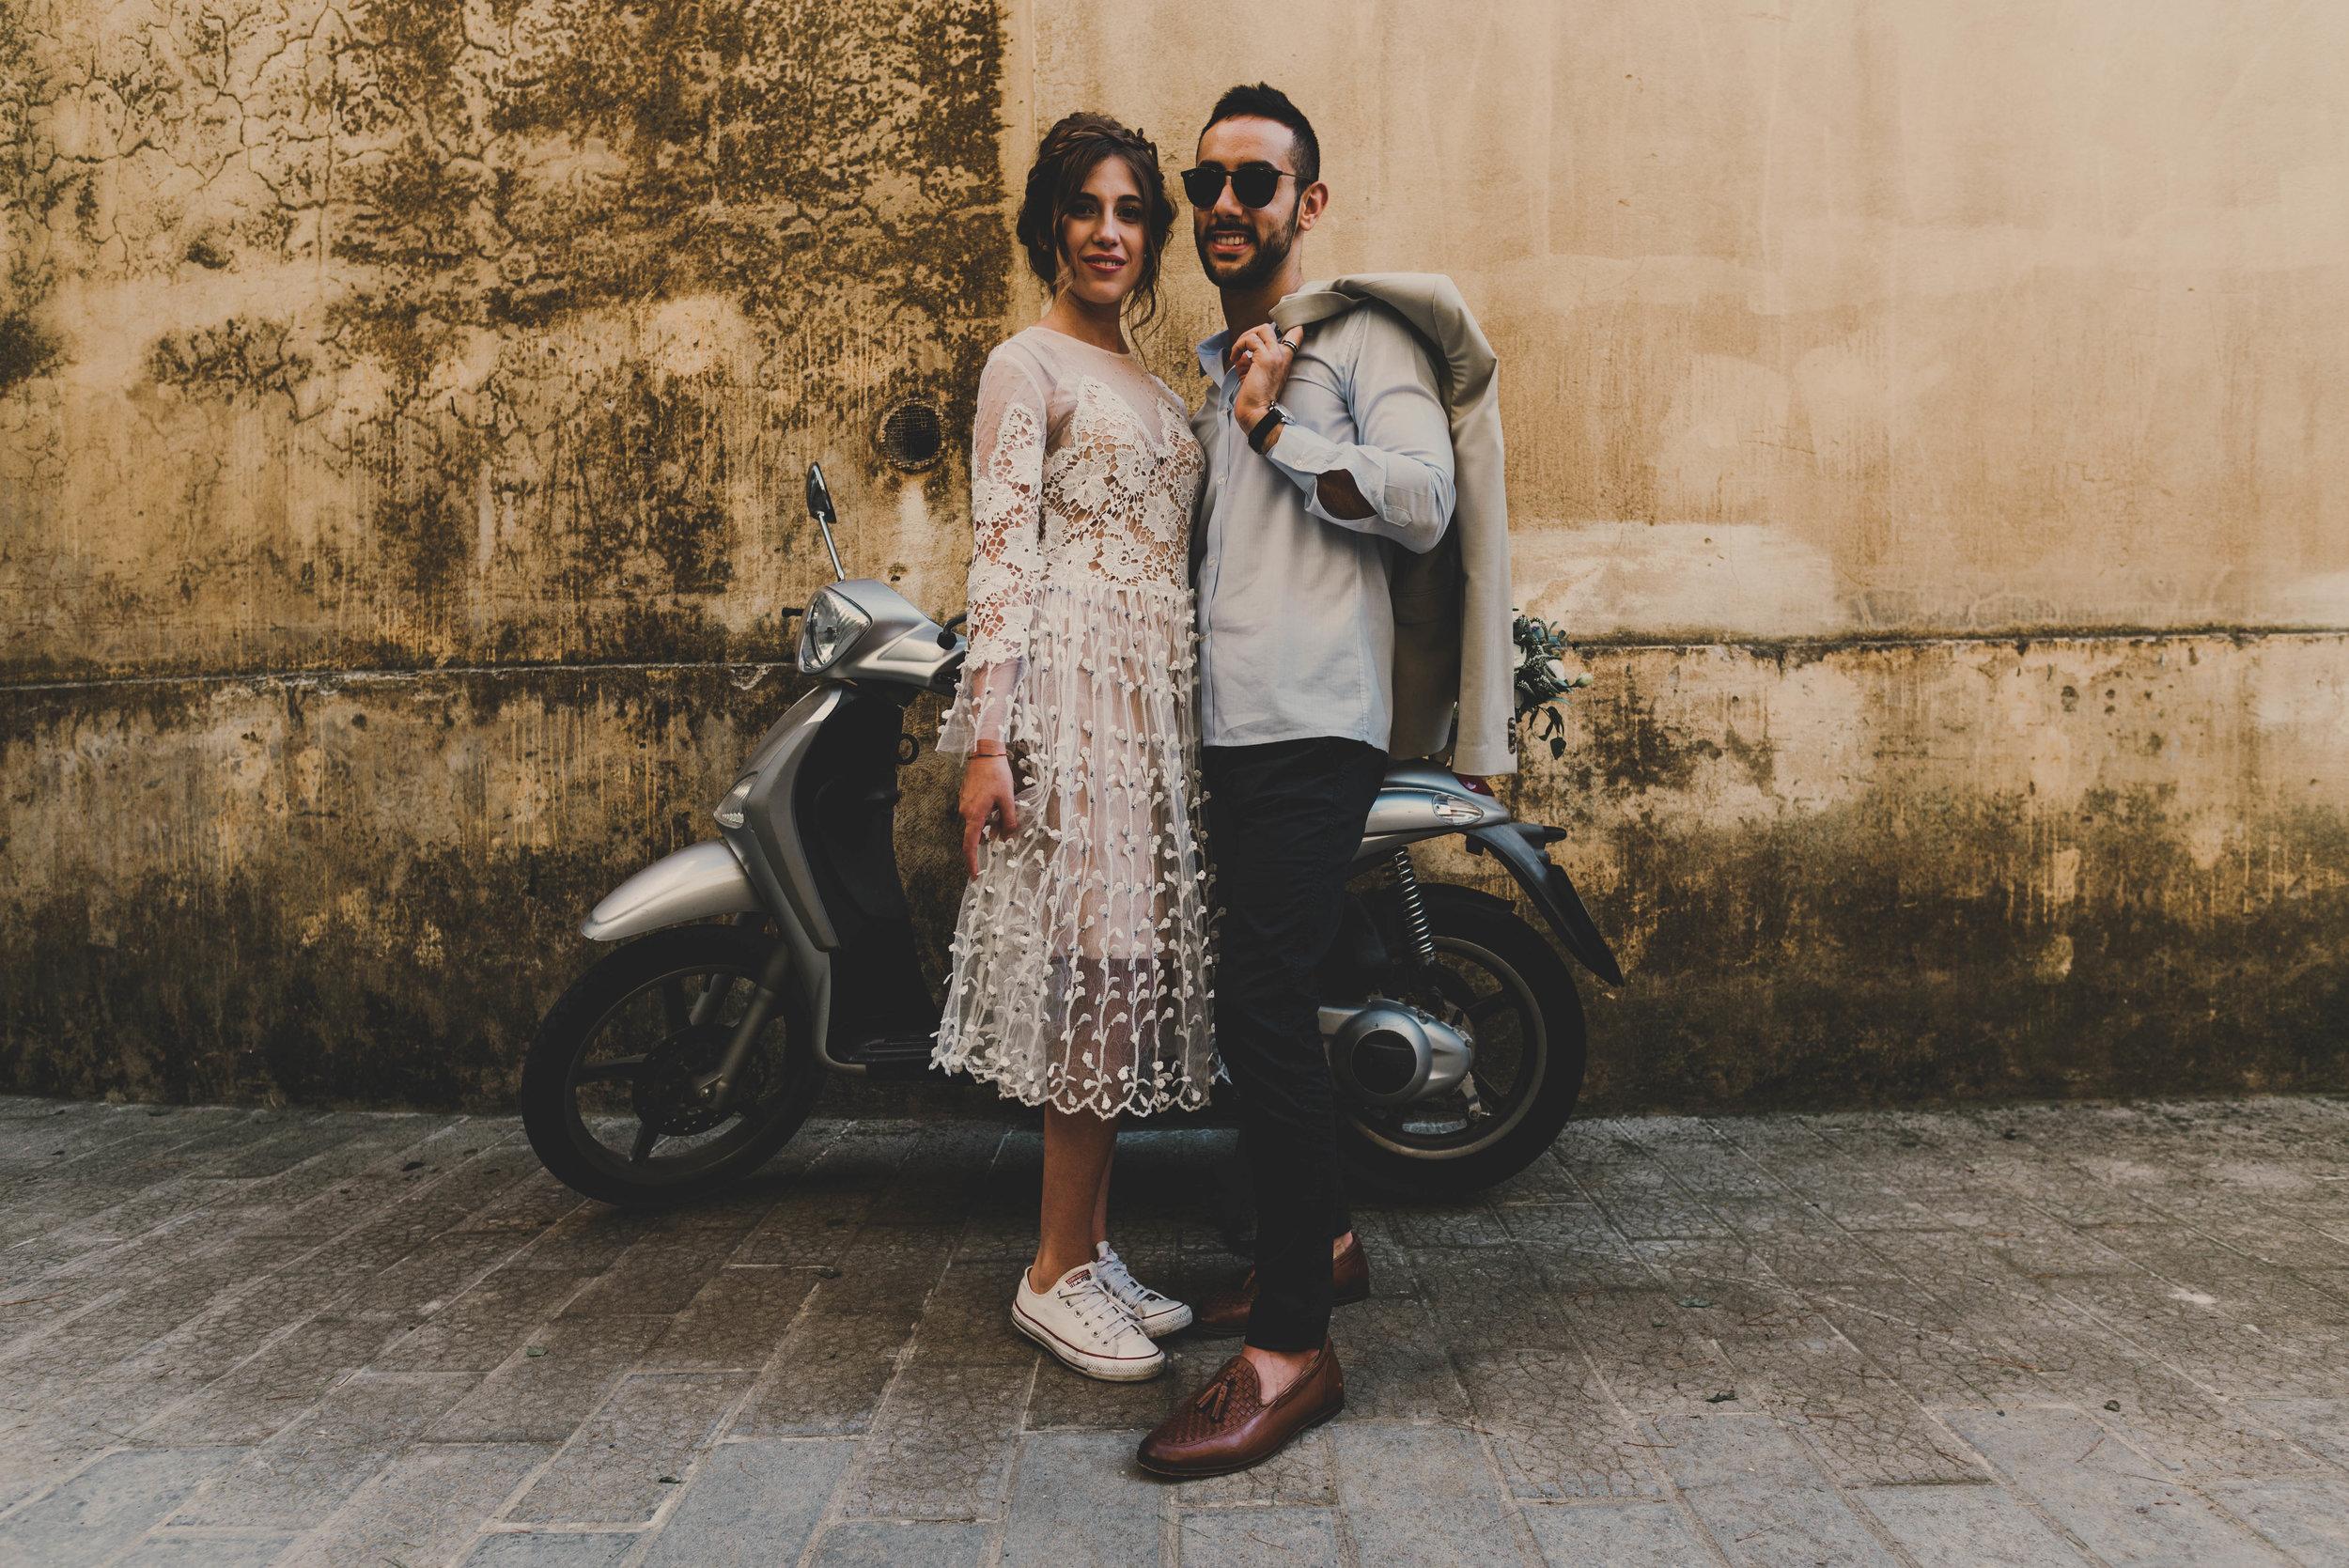 Italy-wedding-photography (16).jpg